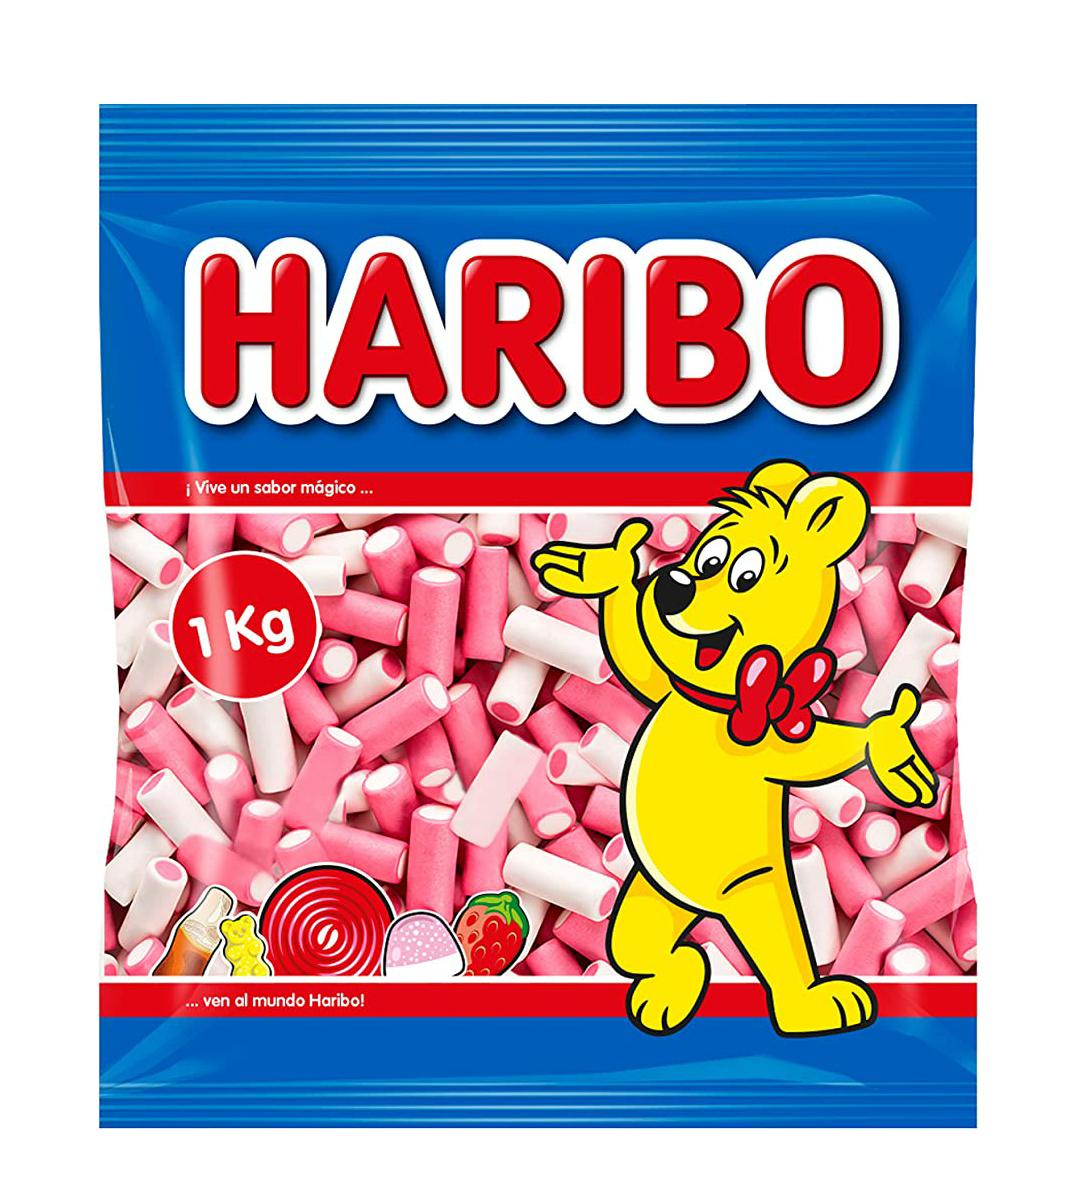 1 kilo Haribo Pink&white!!